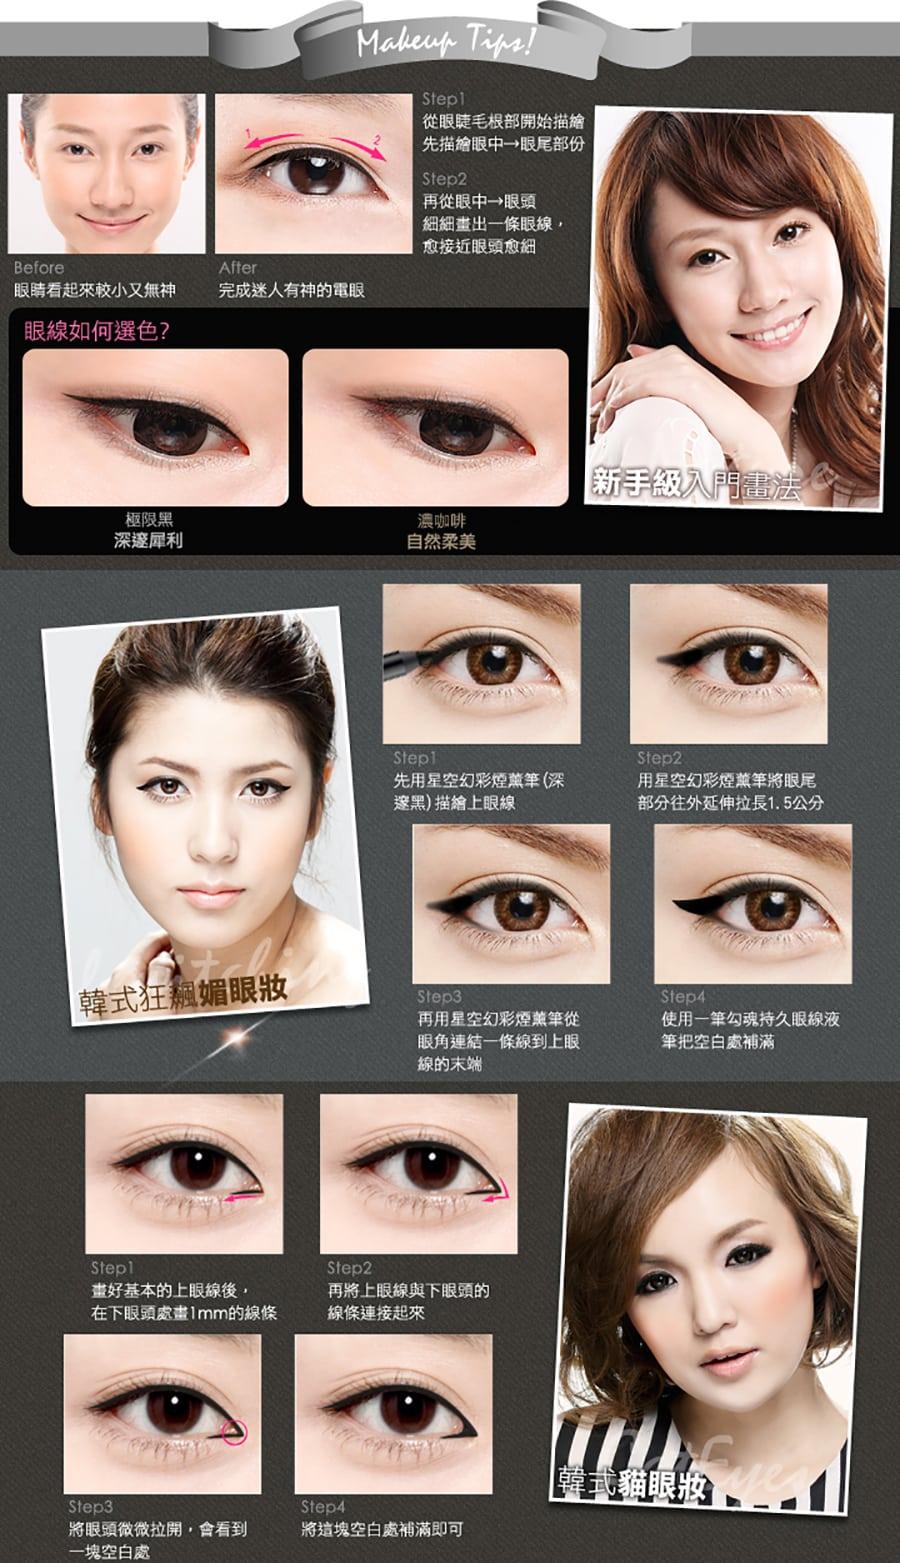 Long-Wear Liquid Eyeliner - Product Usage